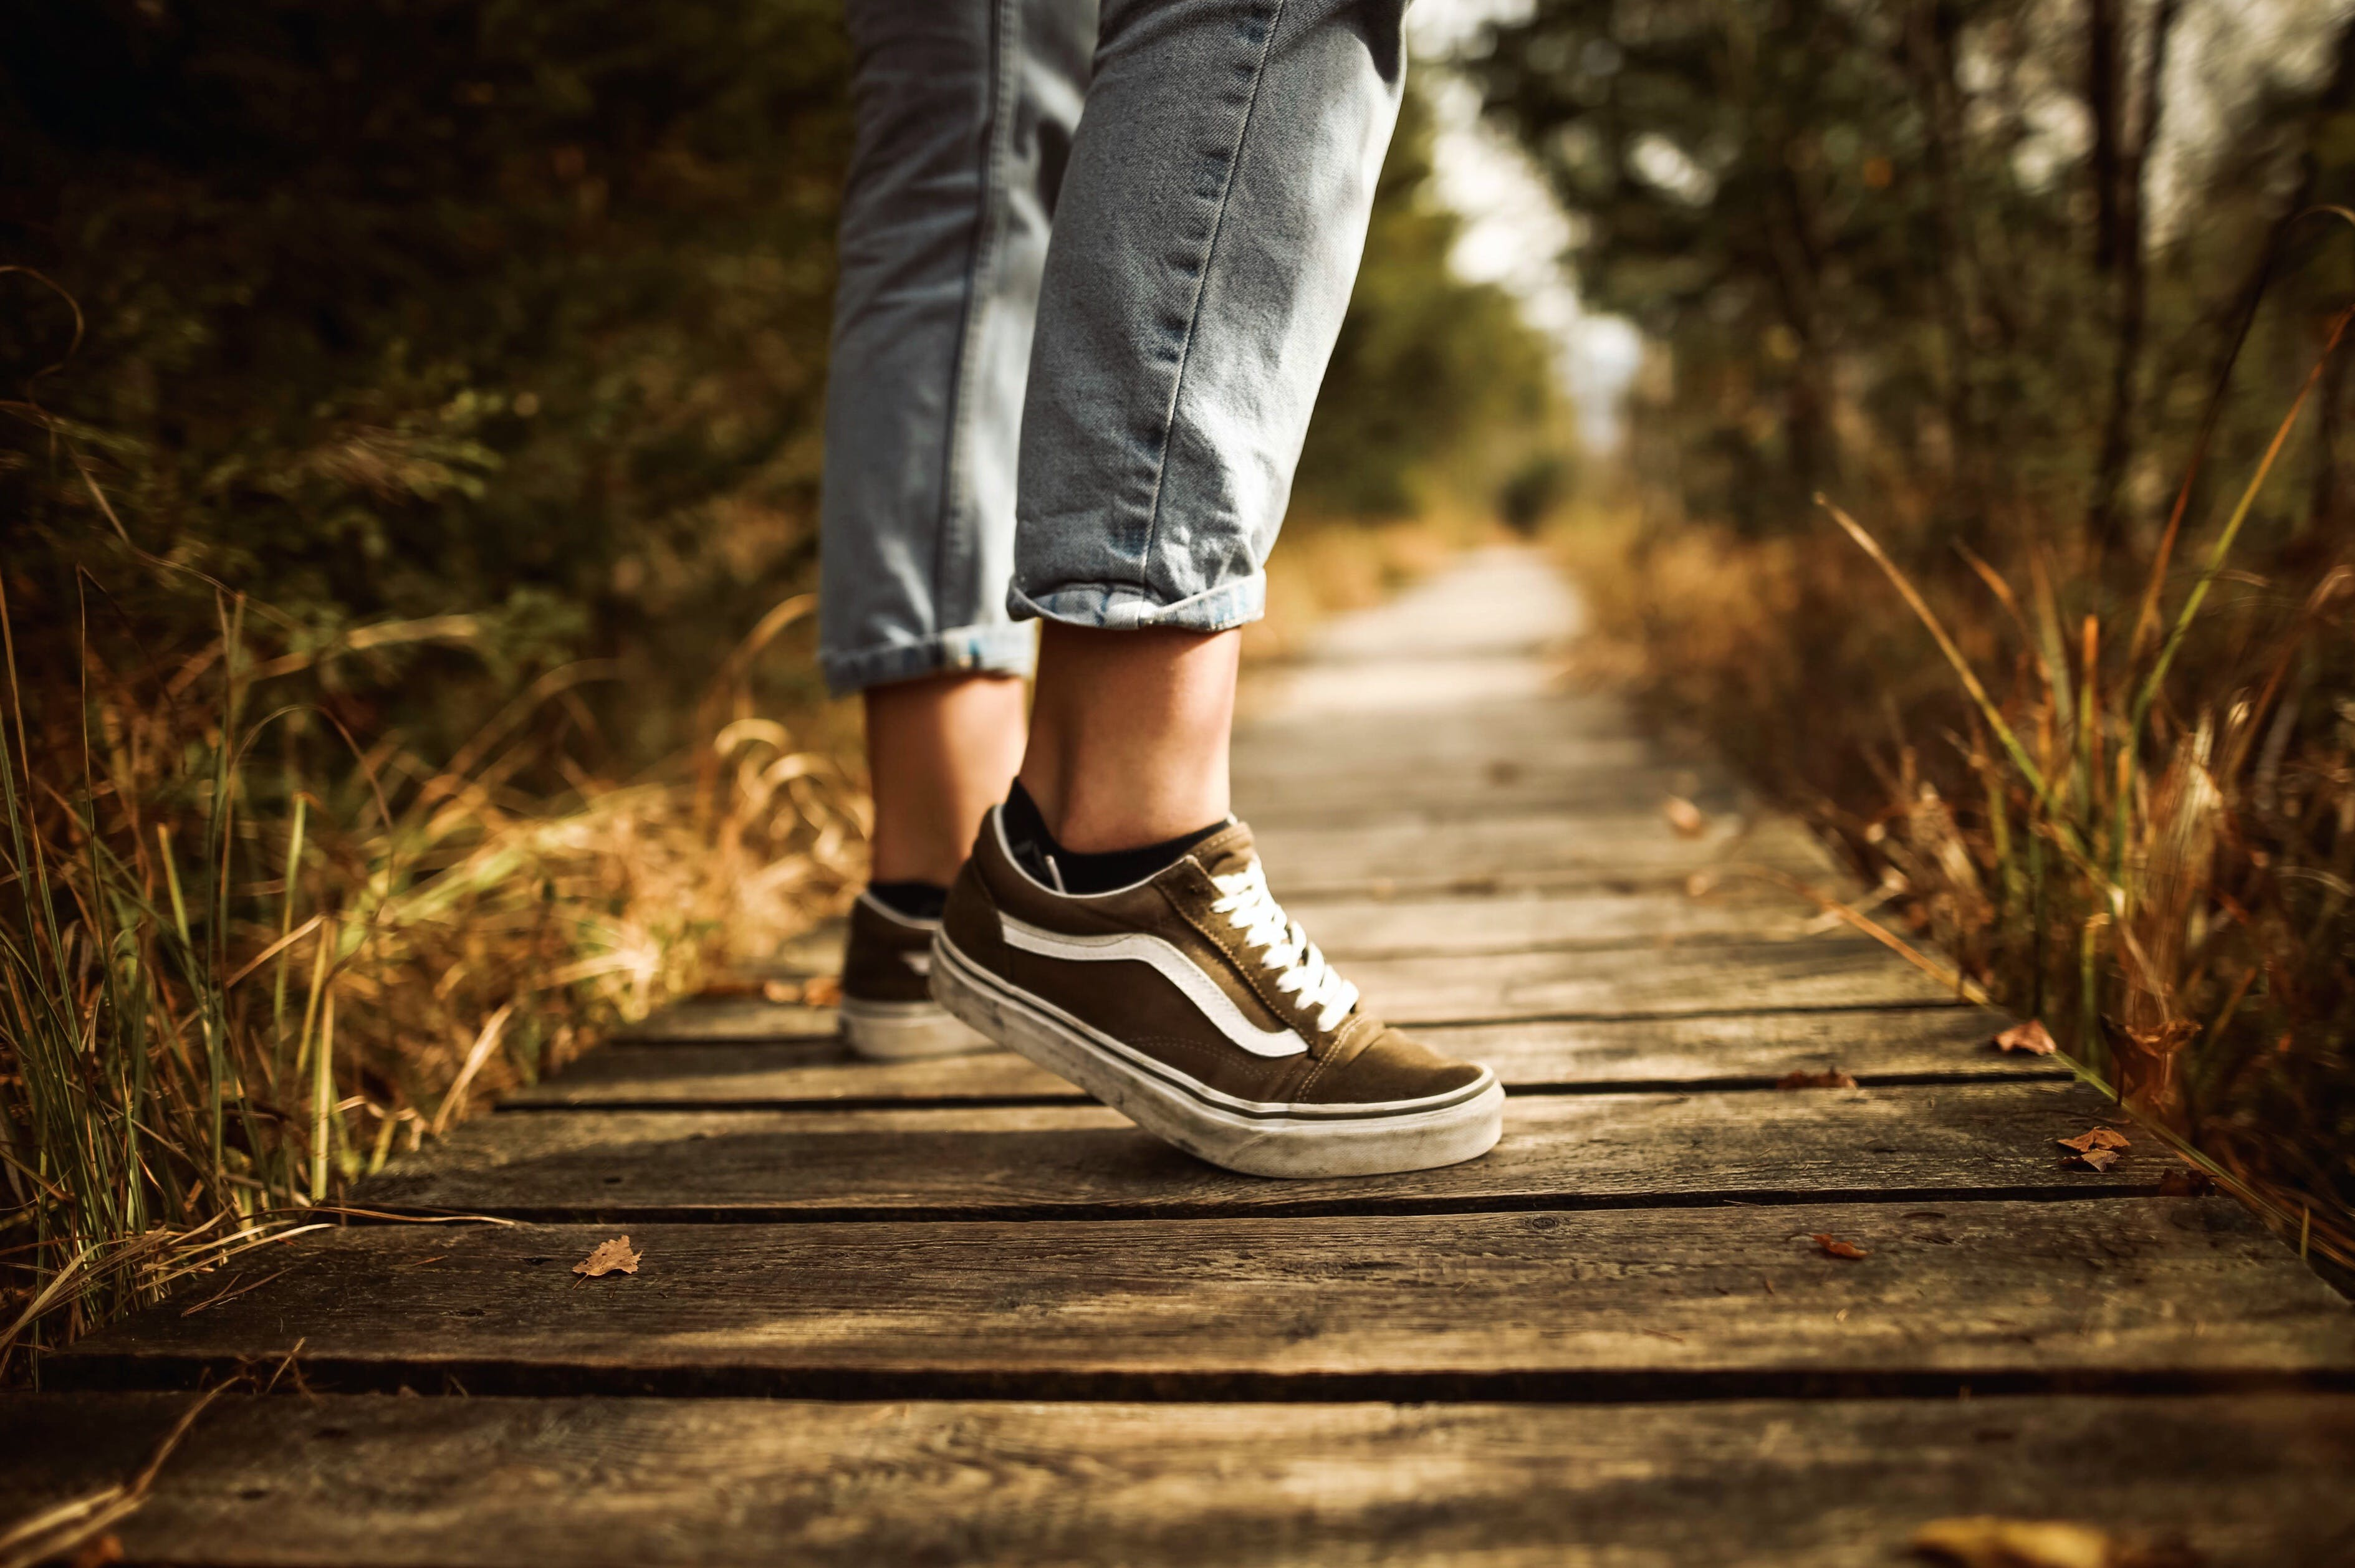 ahşap, ayakkabı, çim